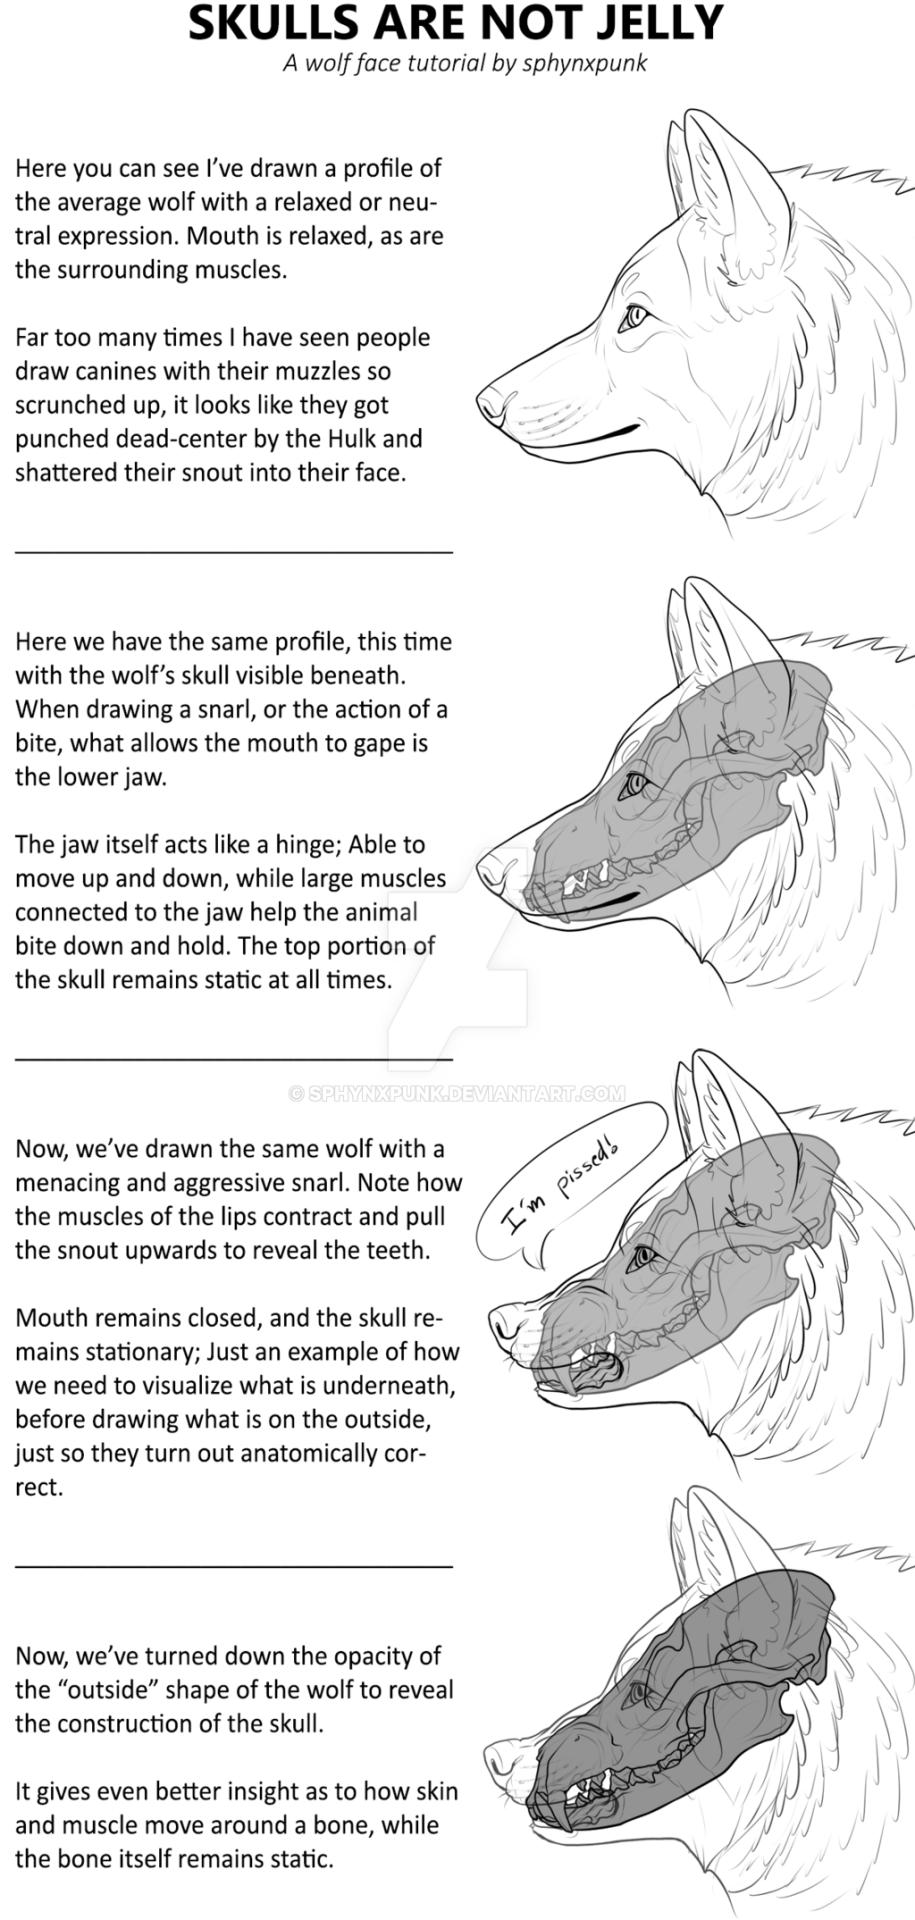 Canine head mini-tutorial: SKULLS ARE NOT JELLY! by sphynxpunk | Art ...